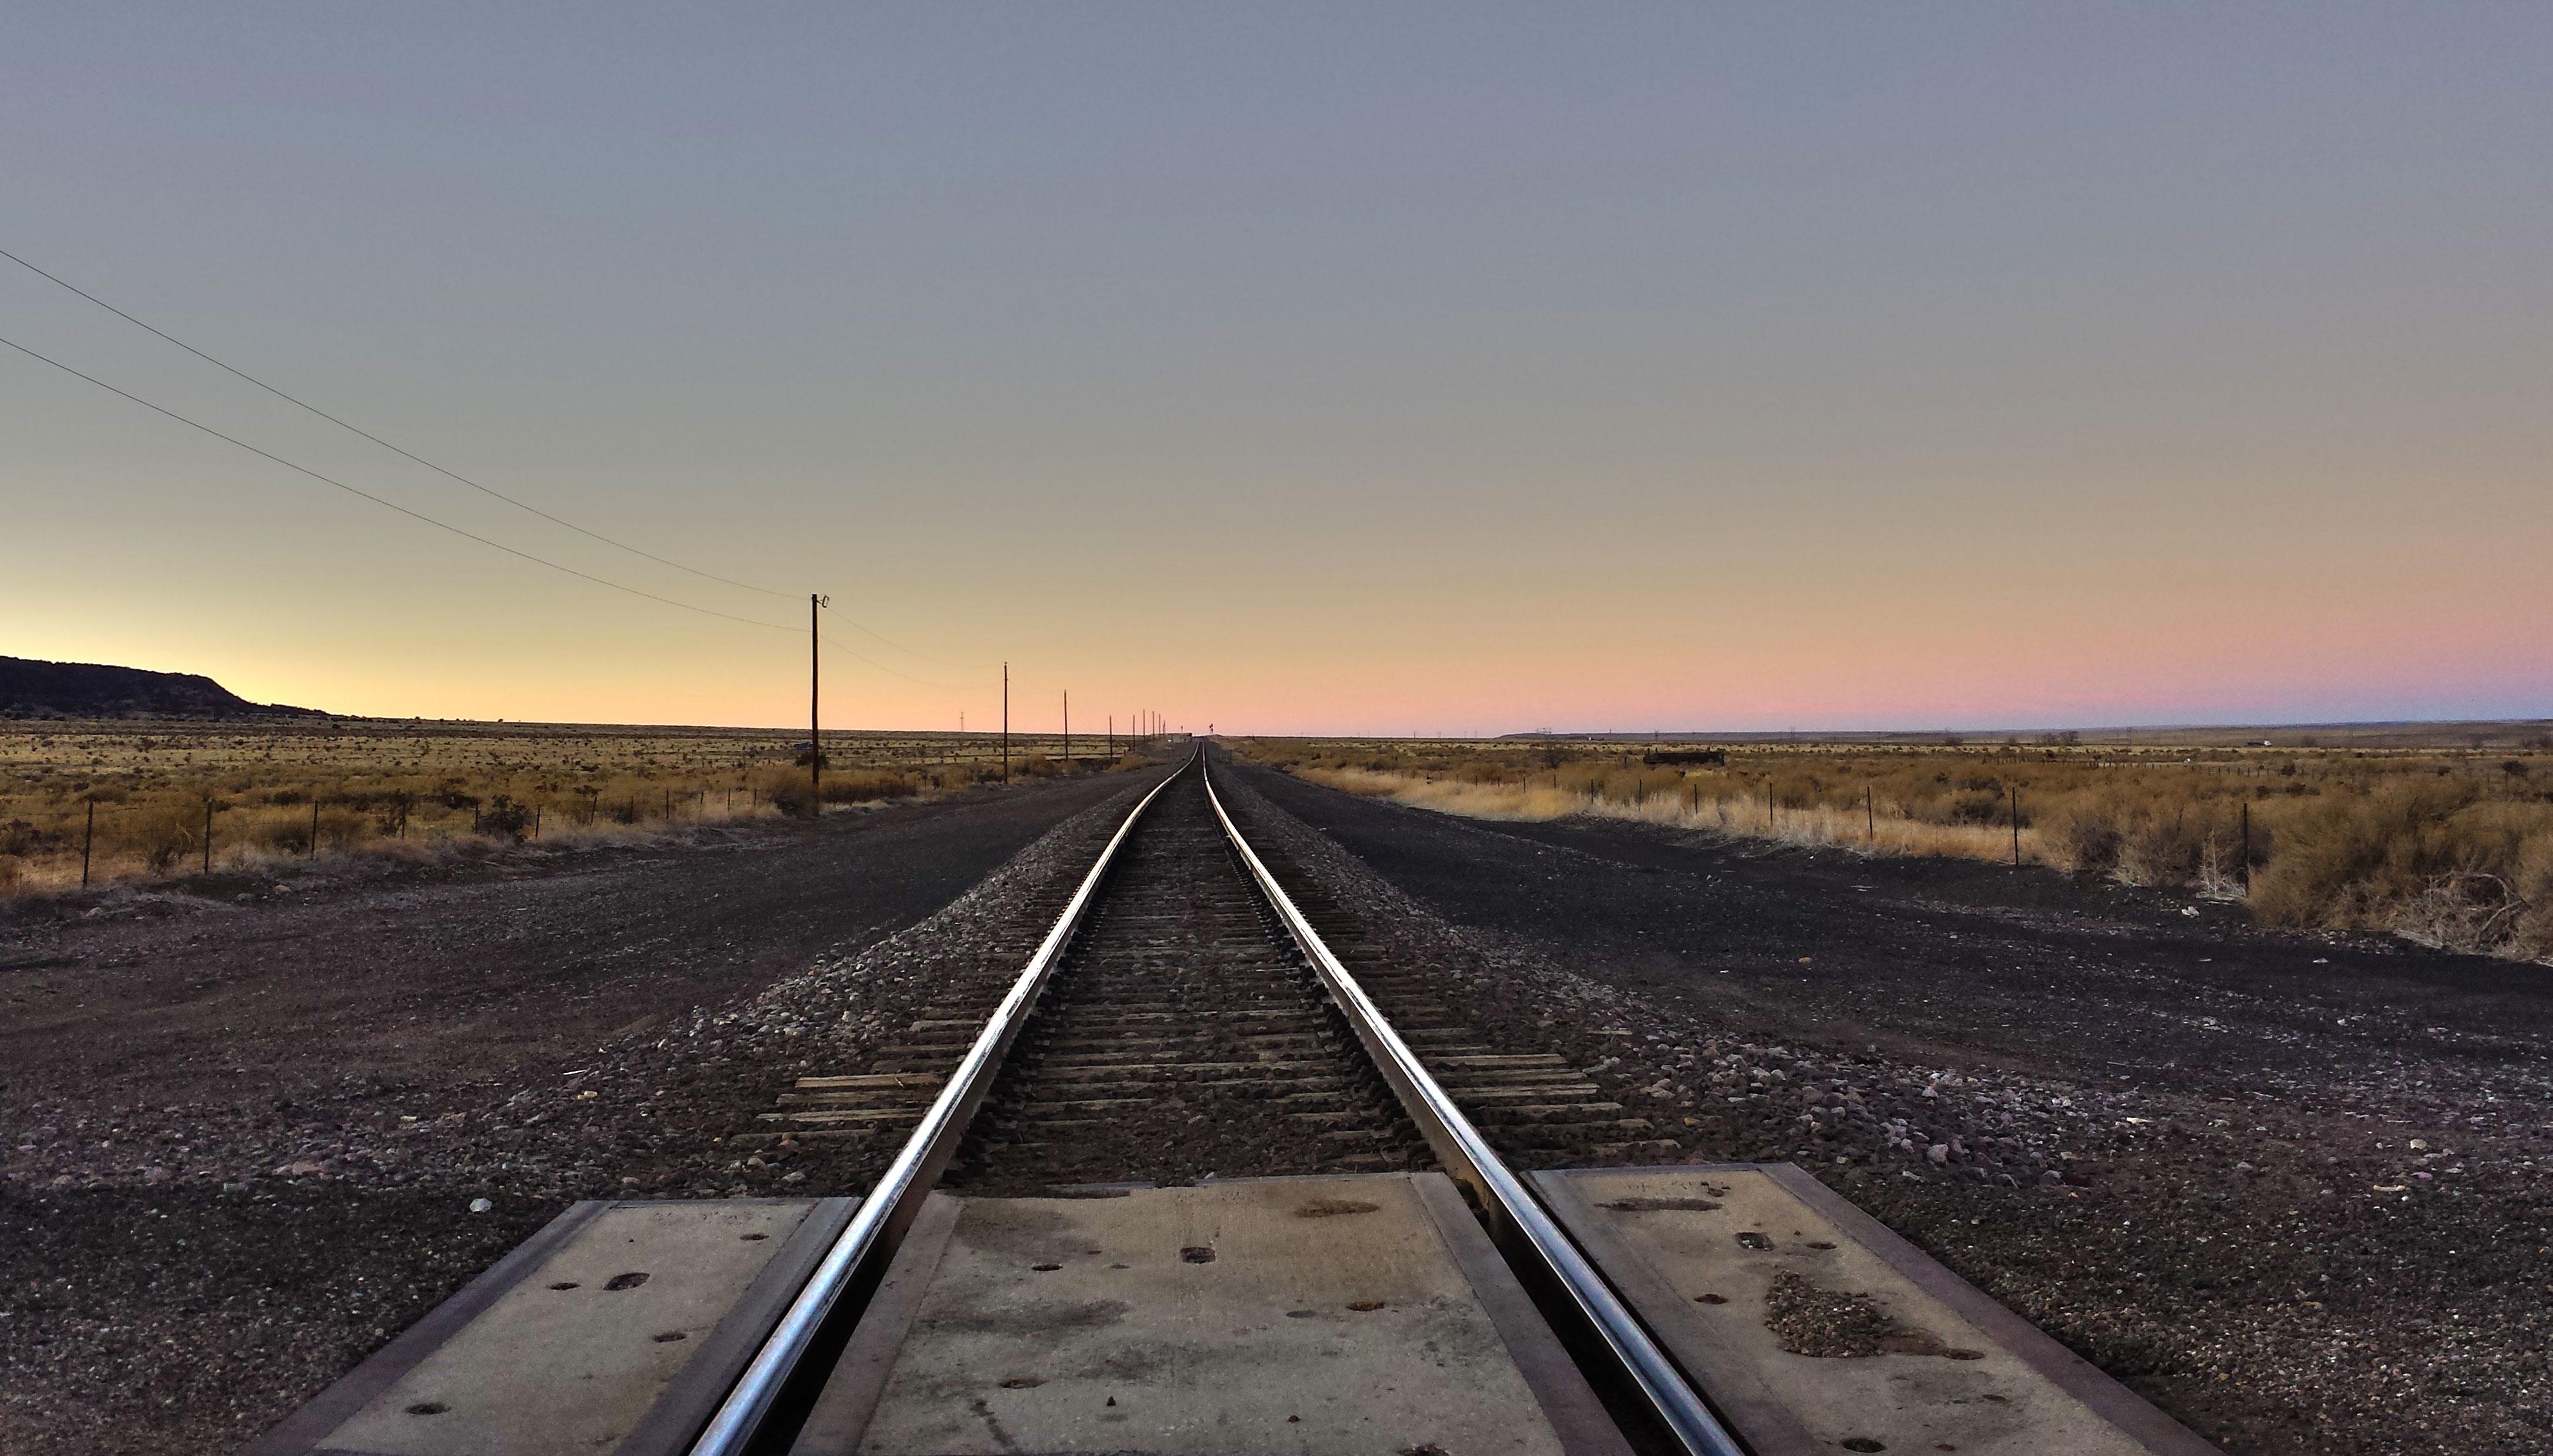 A View Down the Train Tracks - Photograph | Adam Endres